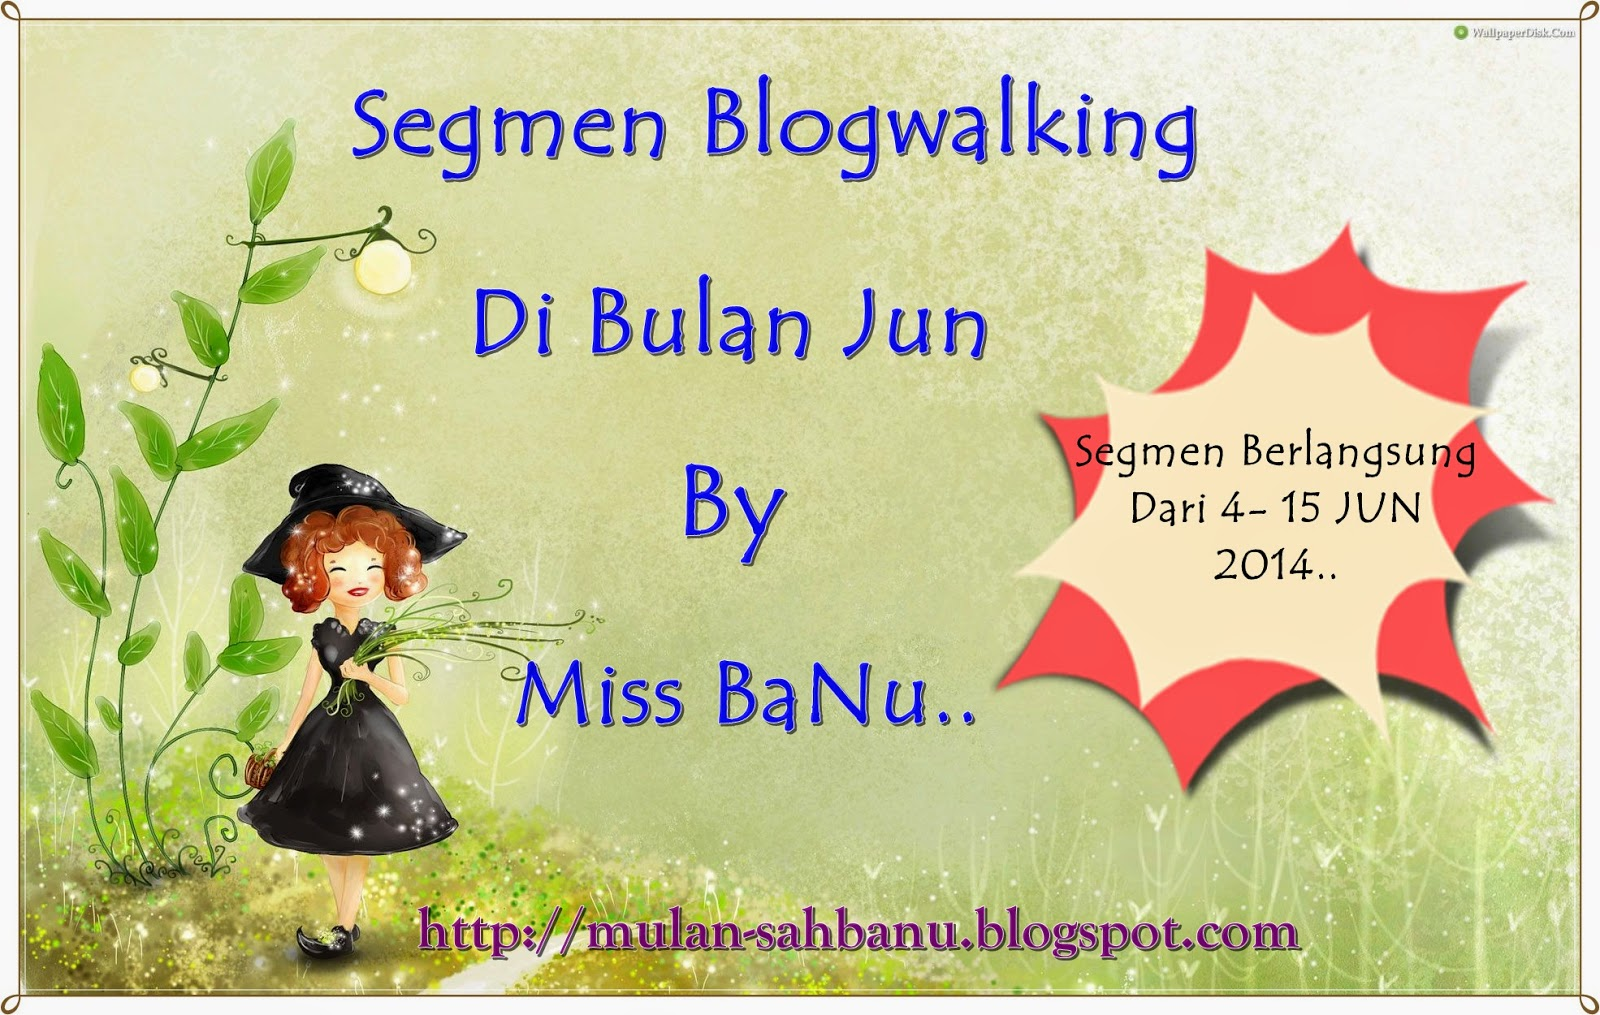 Segmen Blogwalking Di Bulan Jun By Miss BaNu